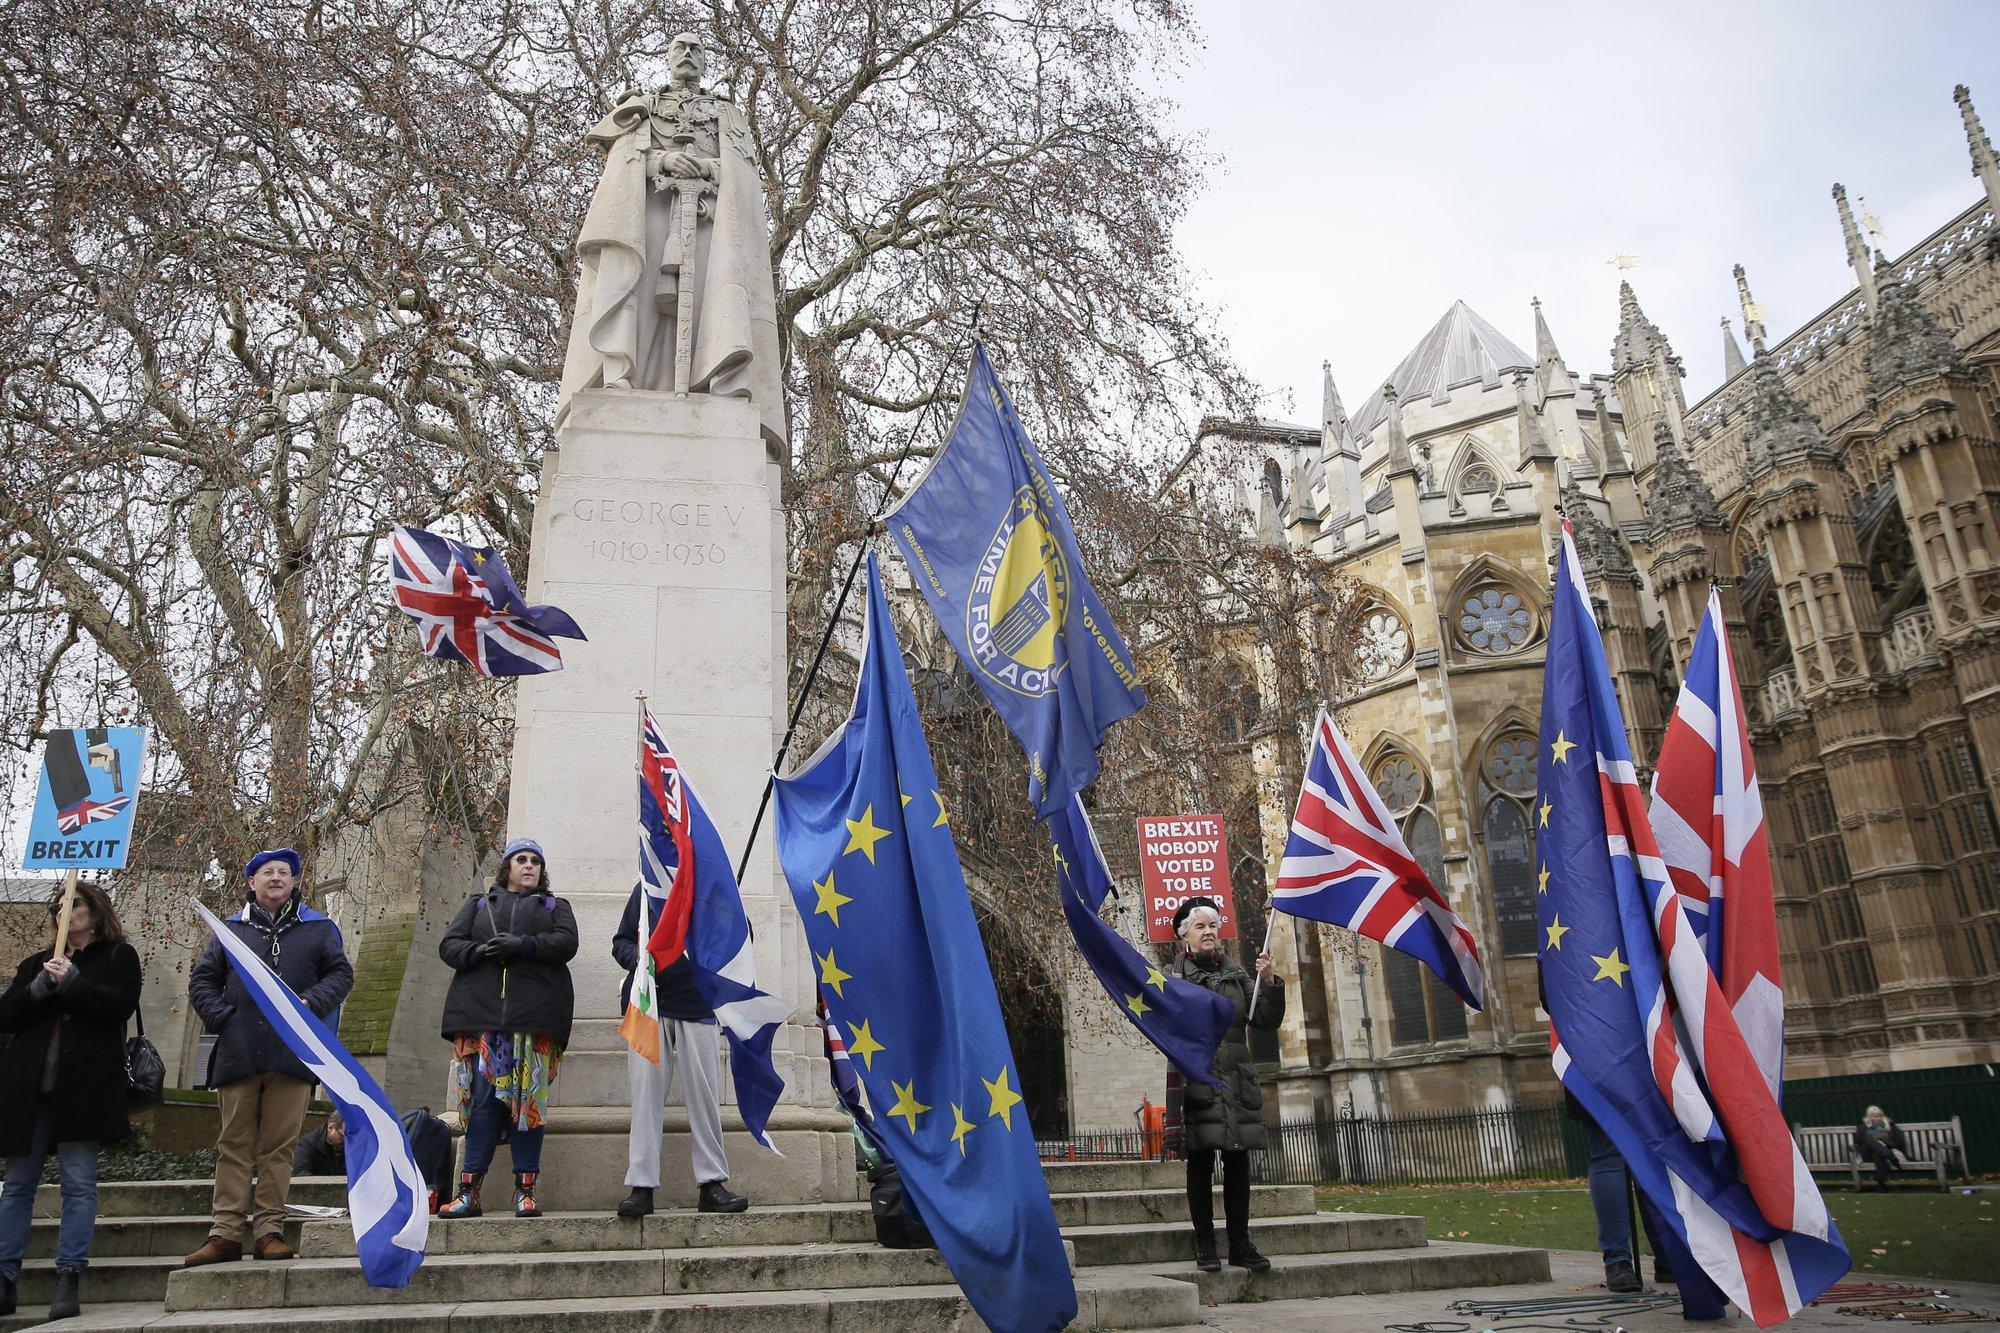 Bank of England warns of intensified Brexit uncertainties